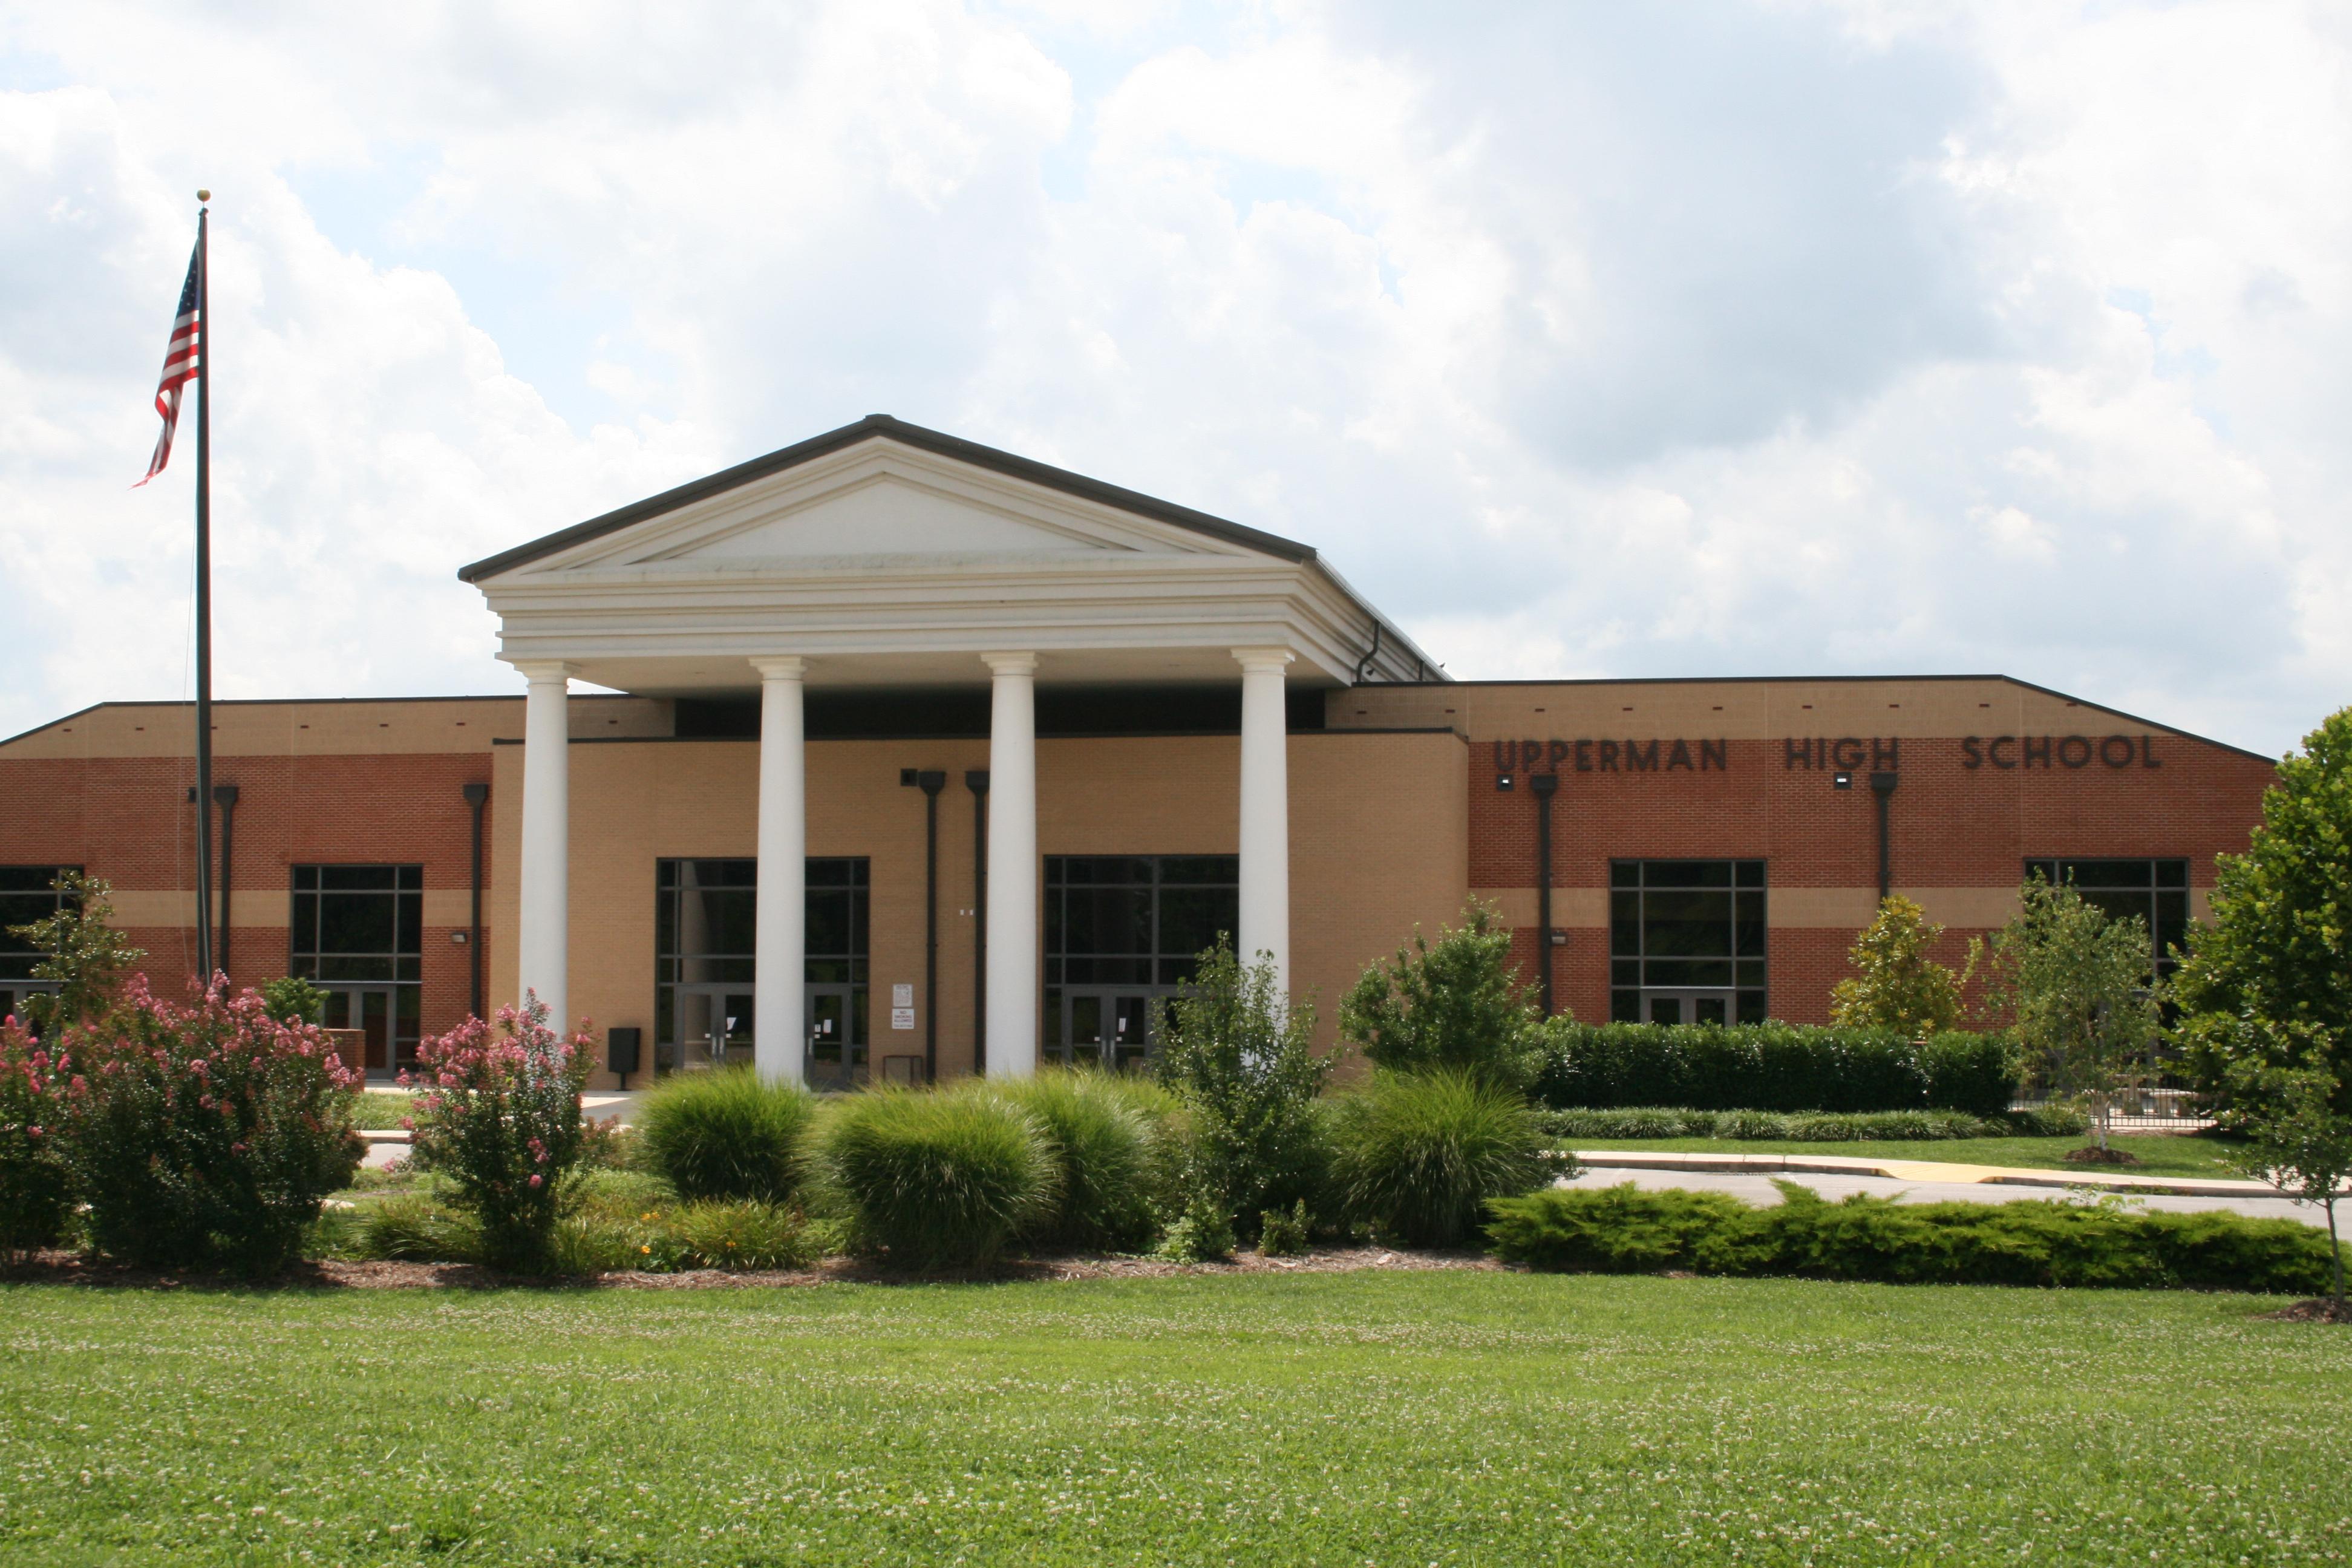 File:Upperman High School.jpg - Wikipedia, the free encyclopedia